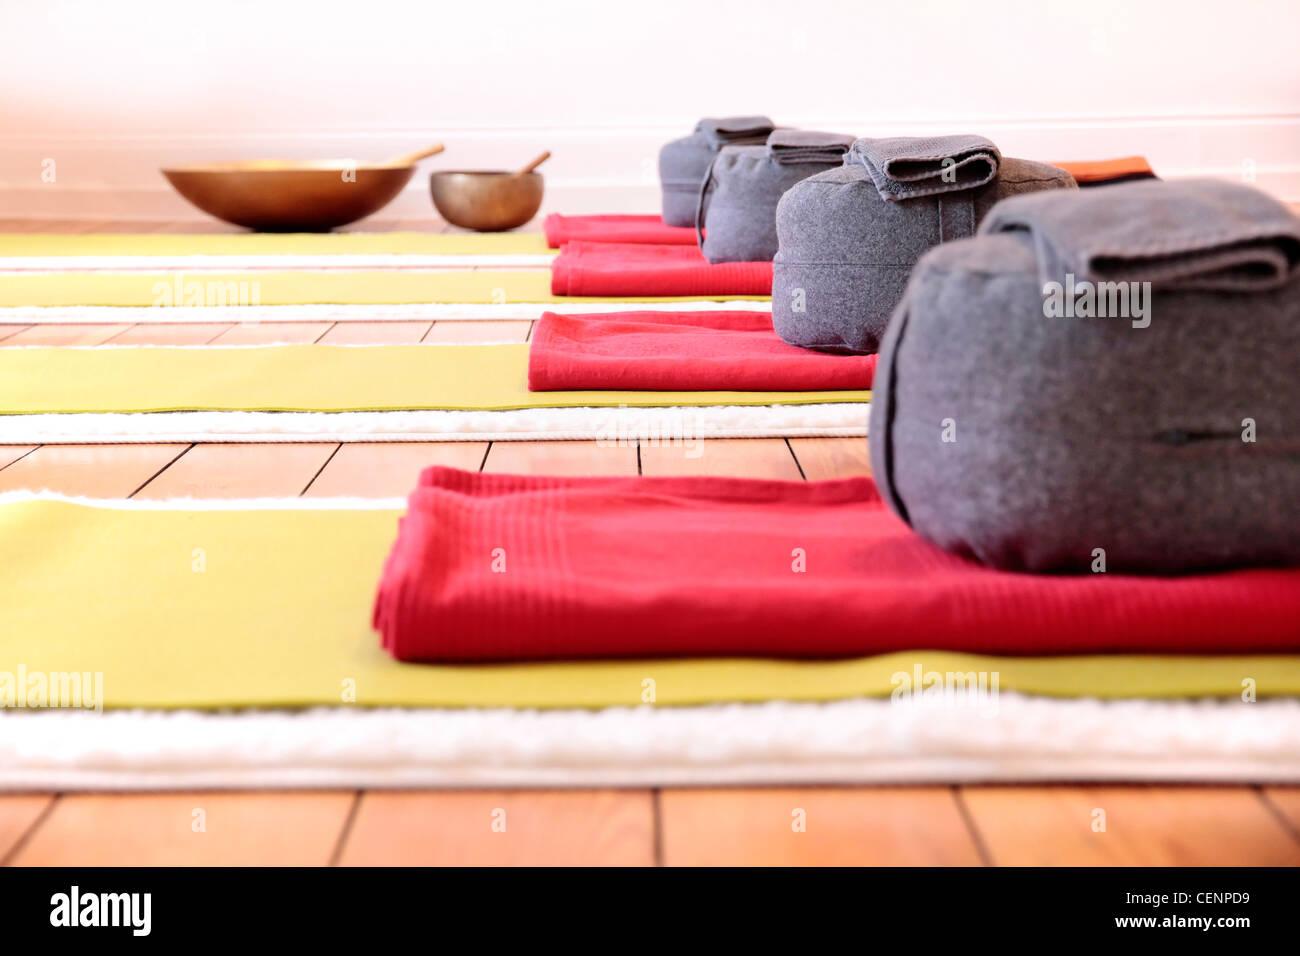 Nahaufnahme von Yoga-Matten und Kissen Yoga im Yoga-studio Stockbild